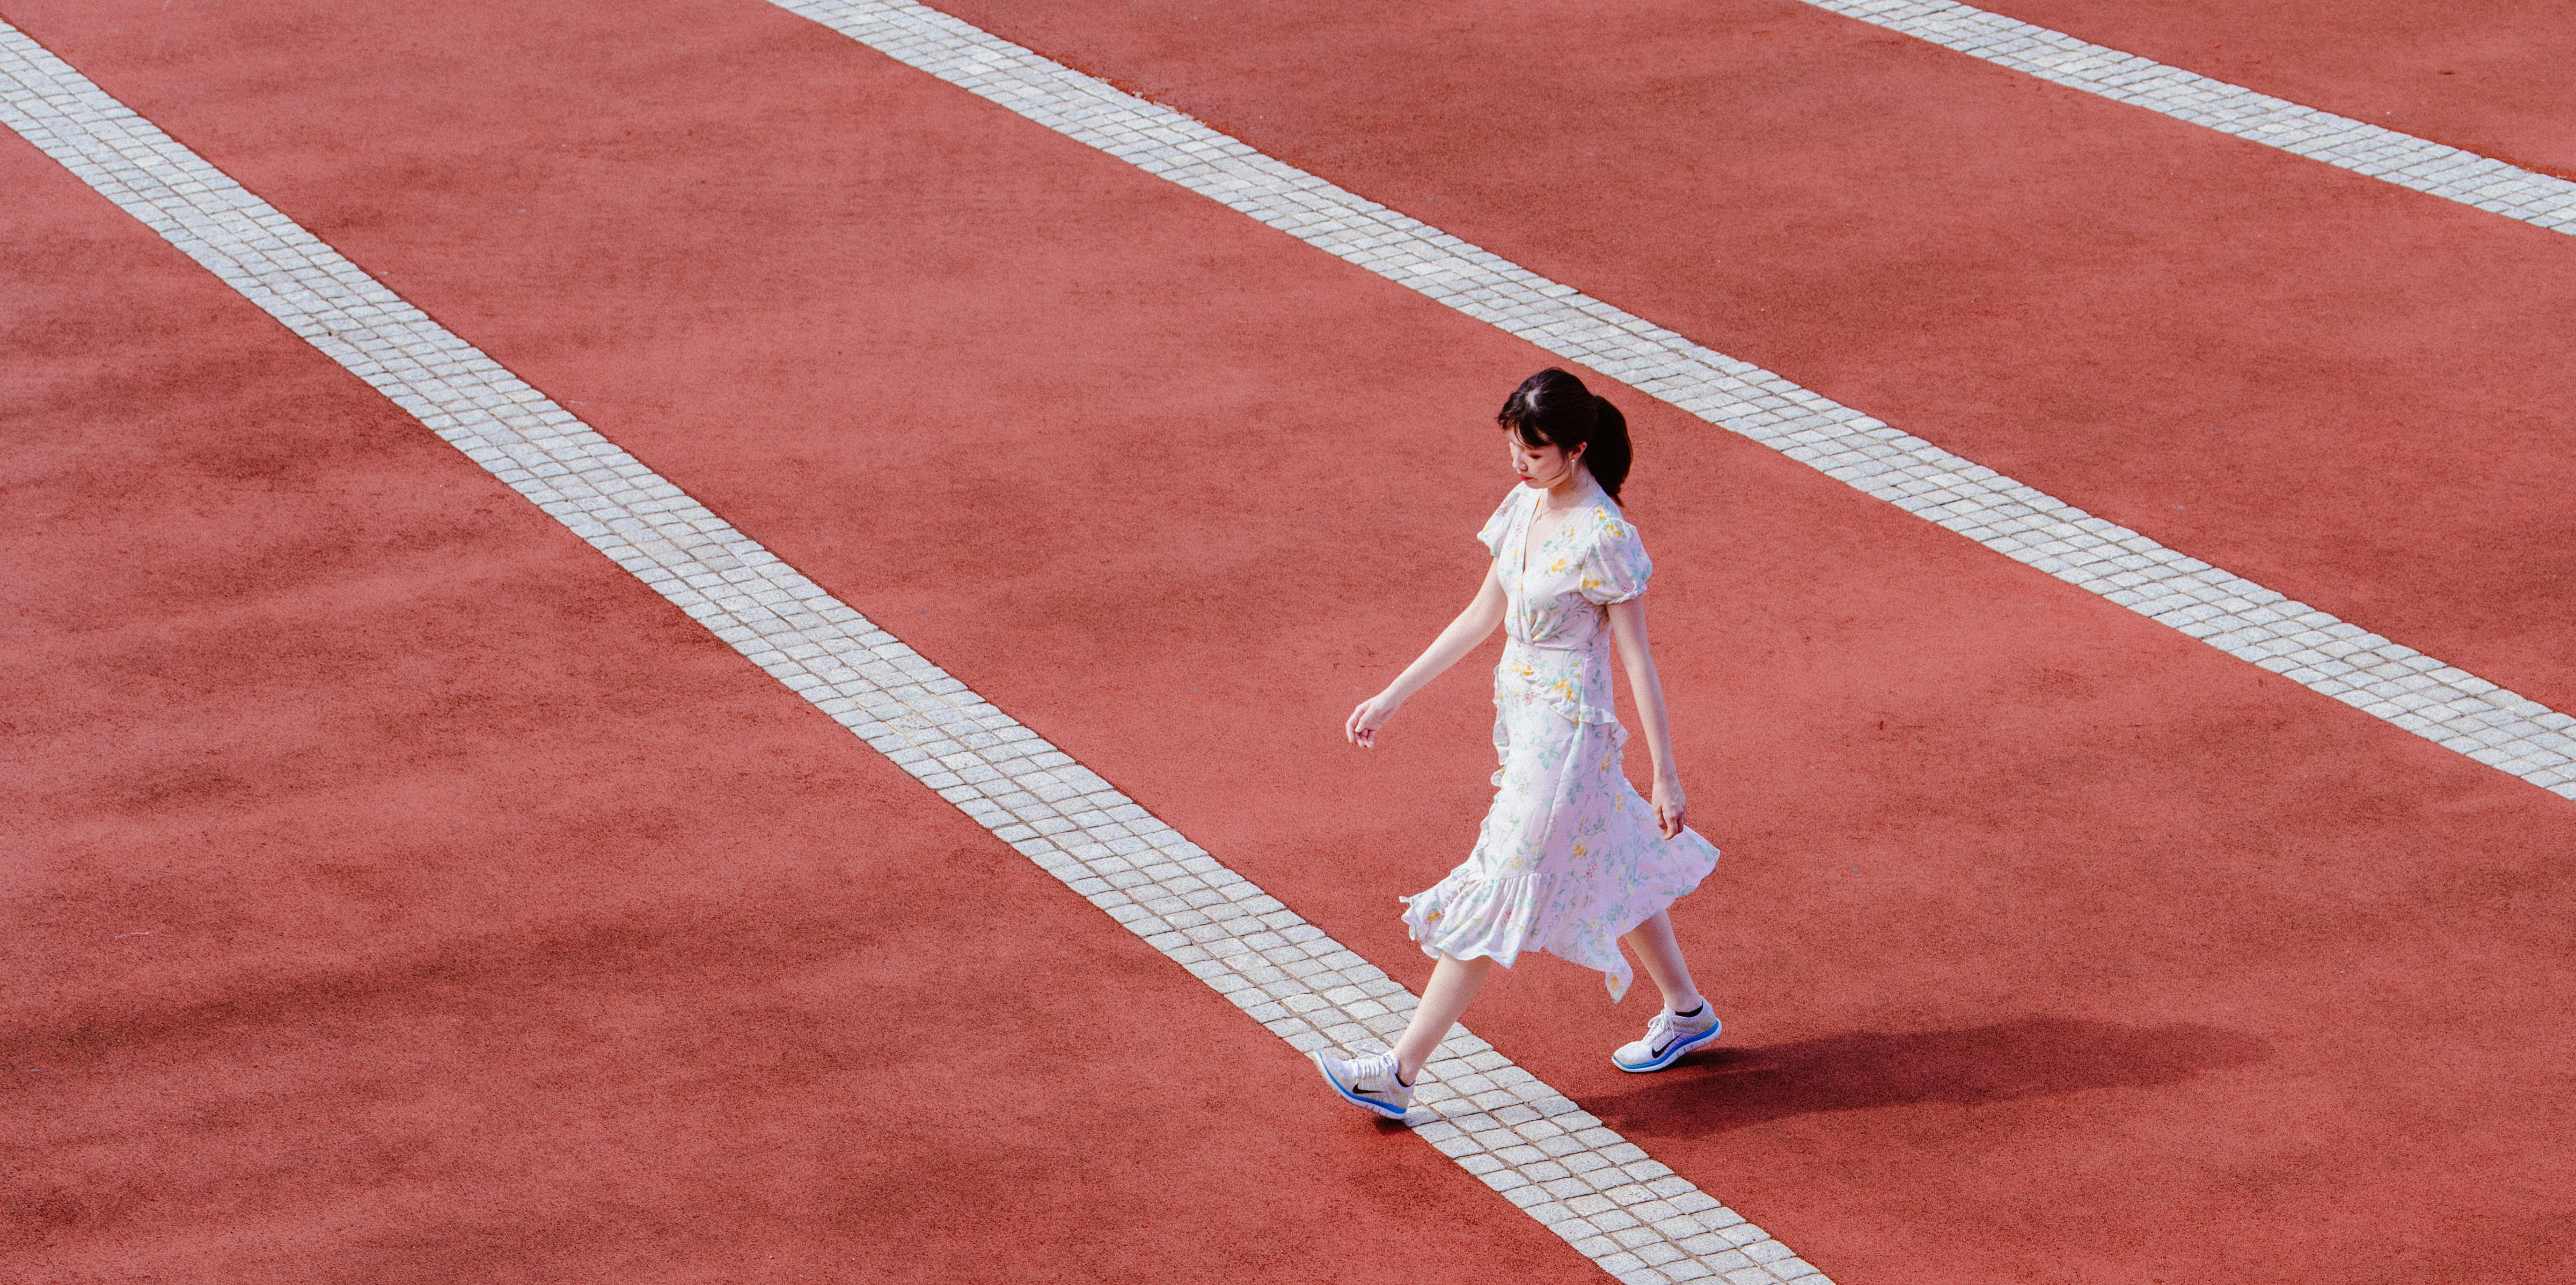 Image: Ryoji Iwata / Unsplash